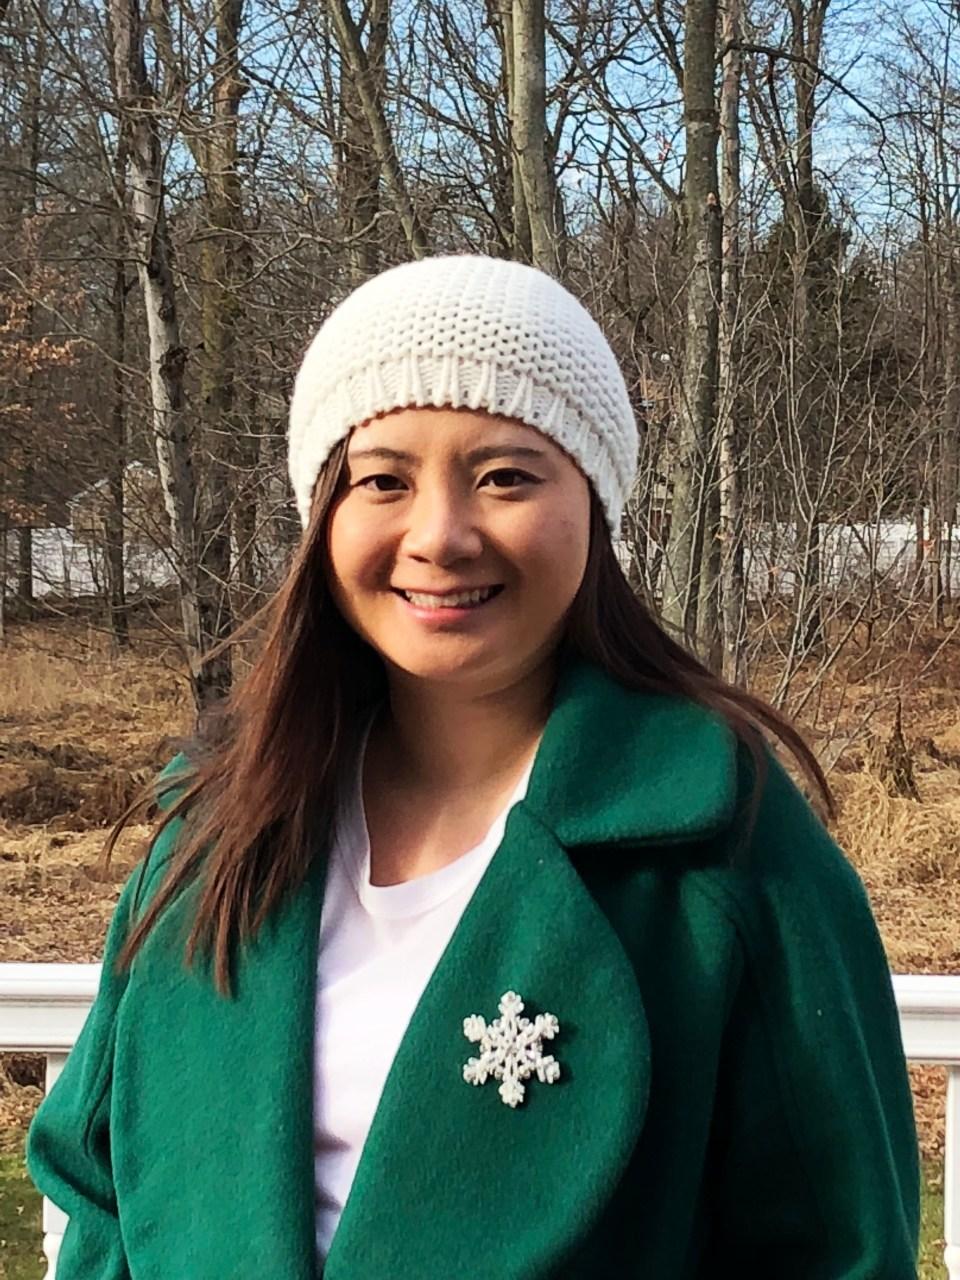 Green Lapel Coat + Snowflake Brooch 4